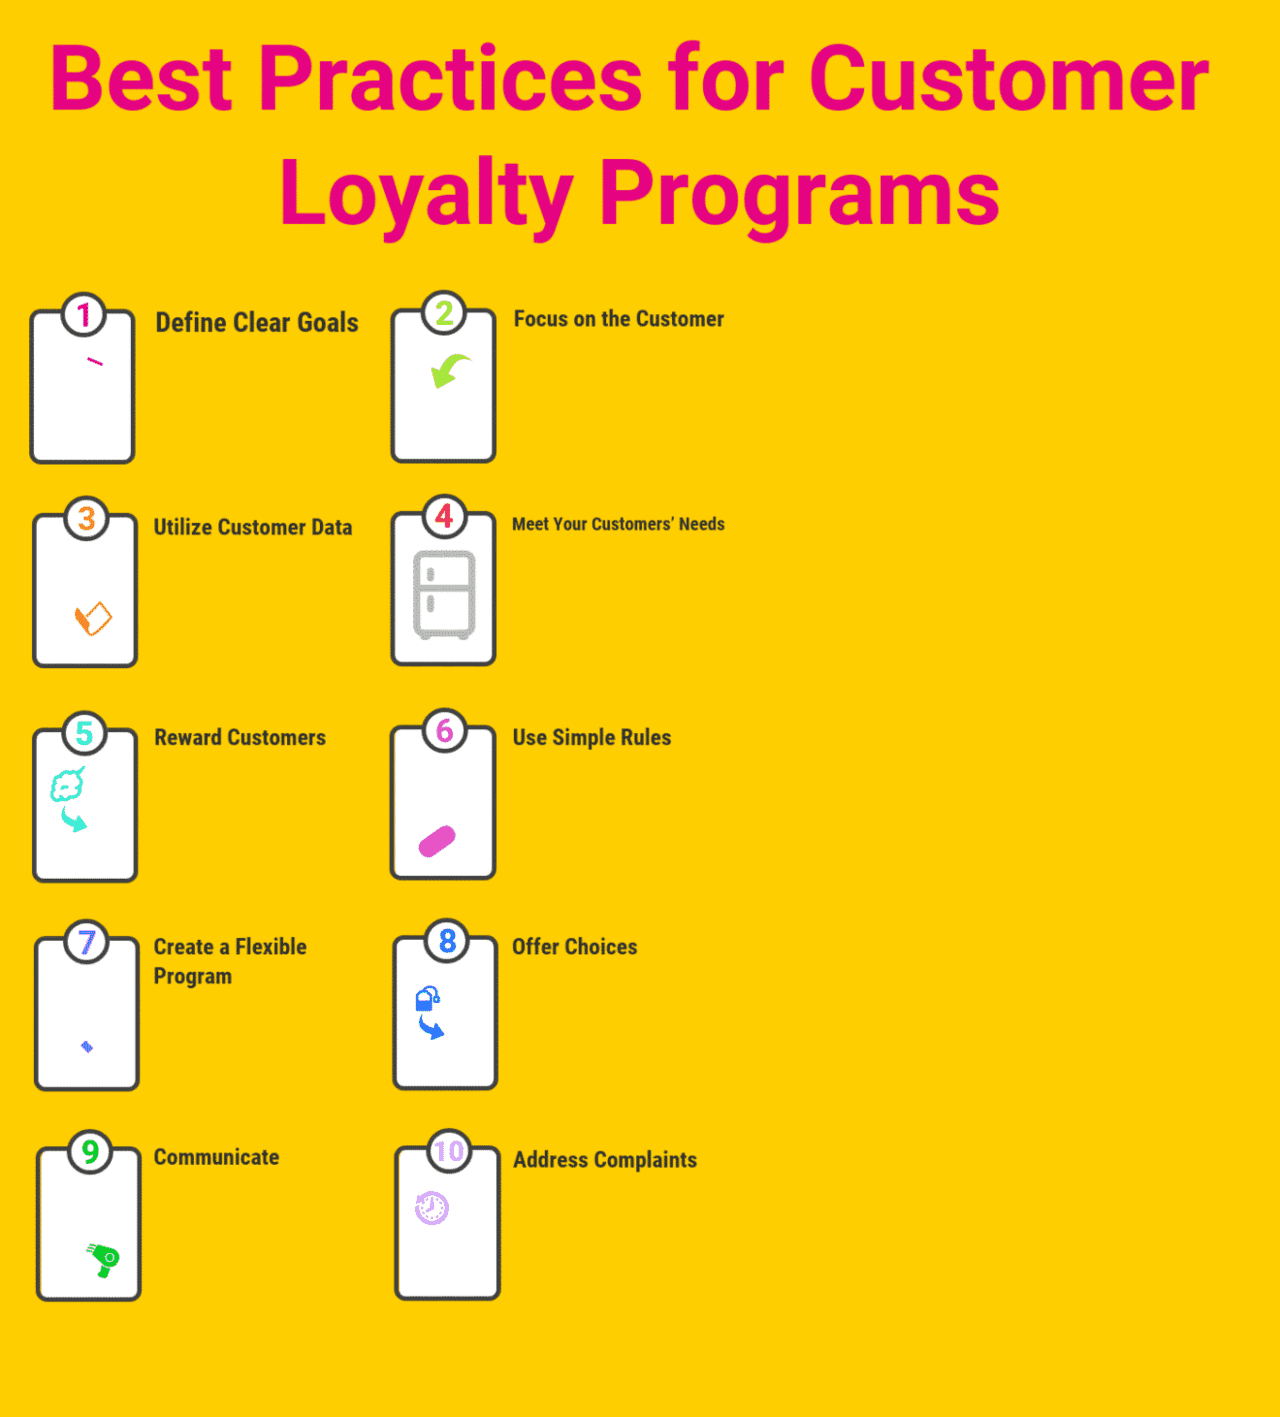 Ten Best Practices for Customer Loyalty Programs